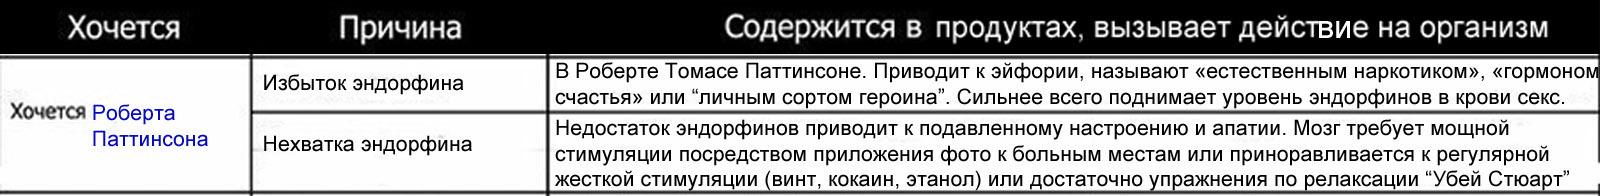 http://s4.uploads.ru/tpYky.jpg